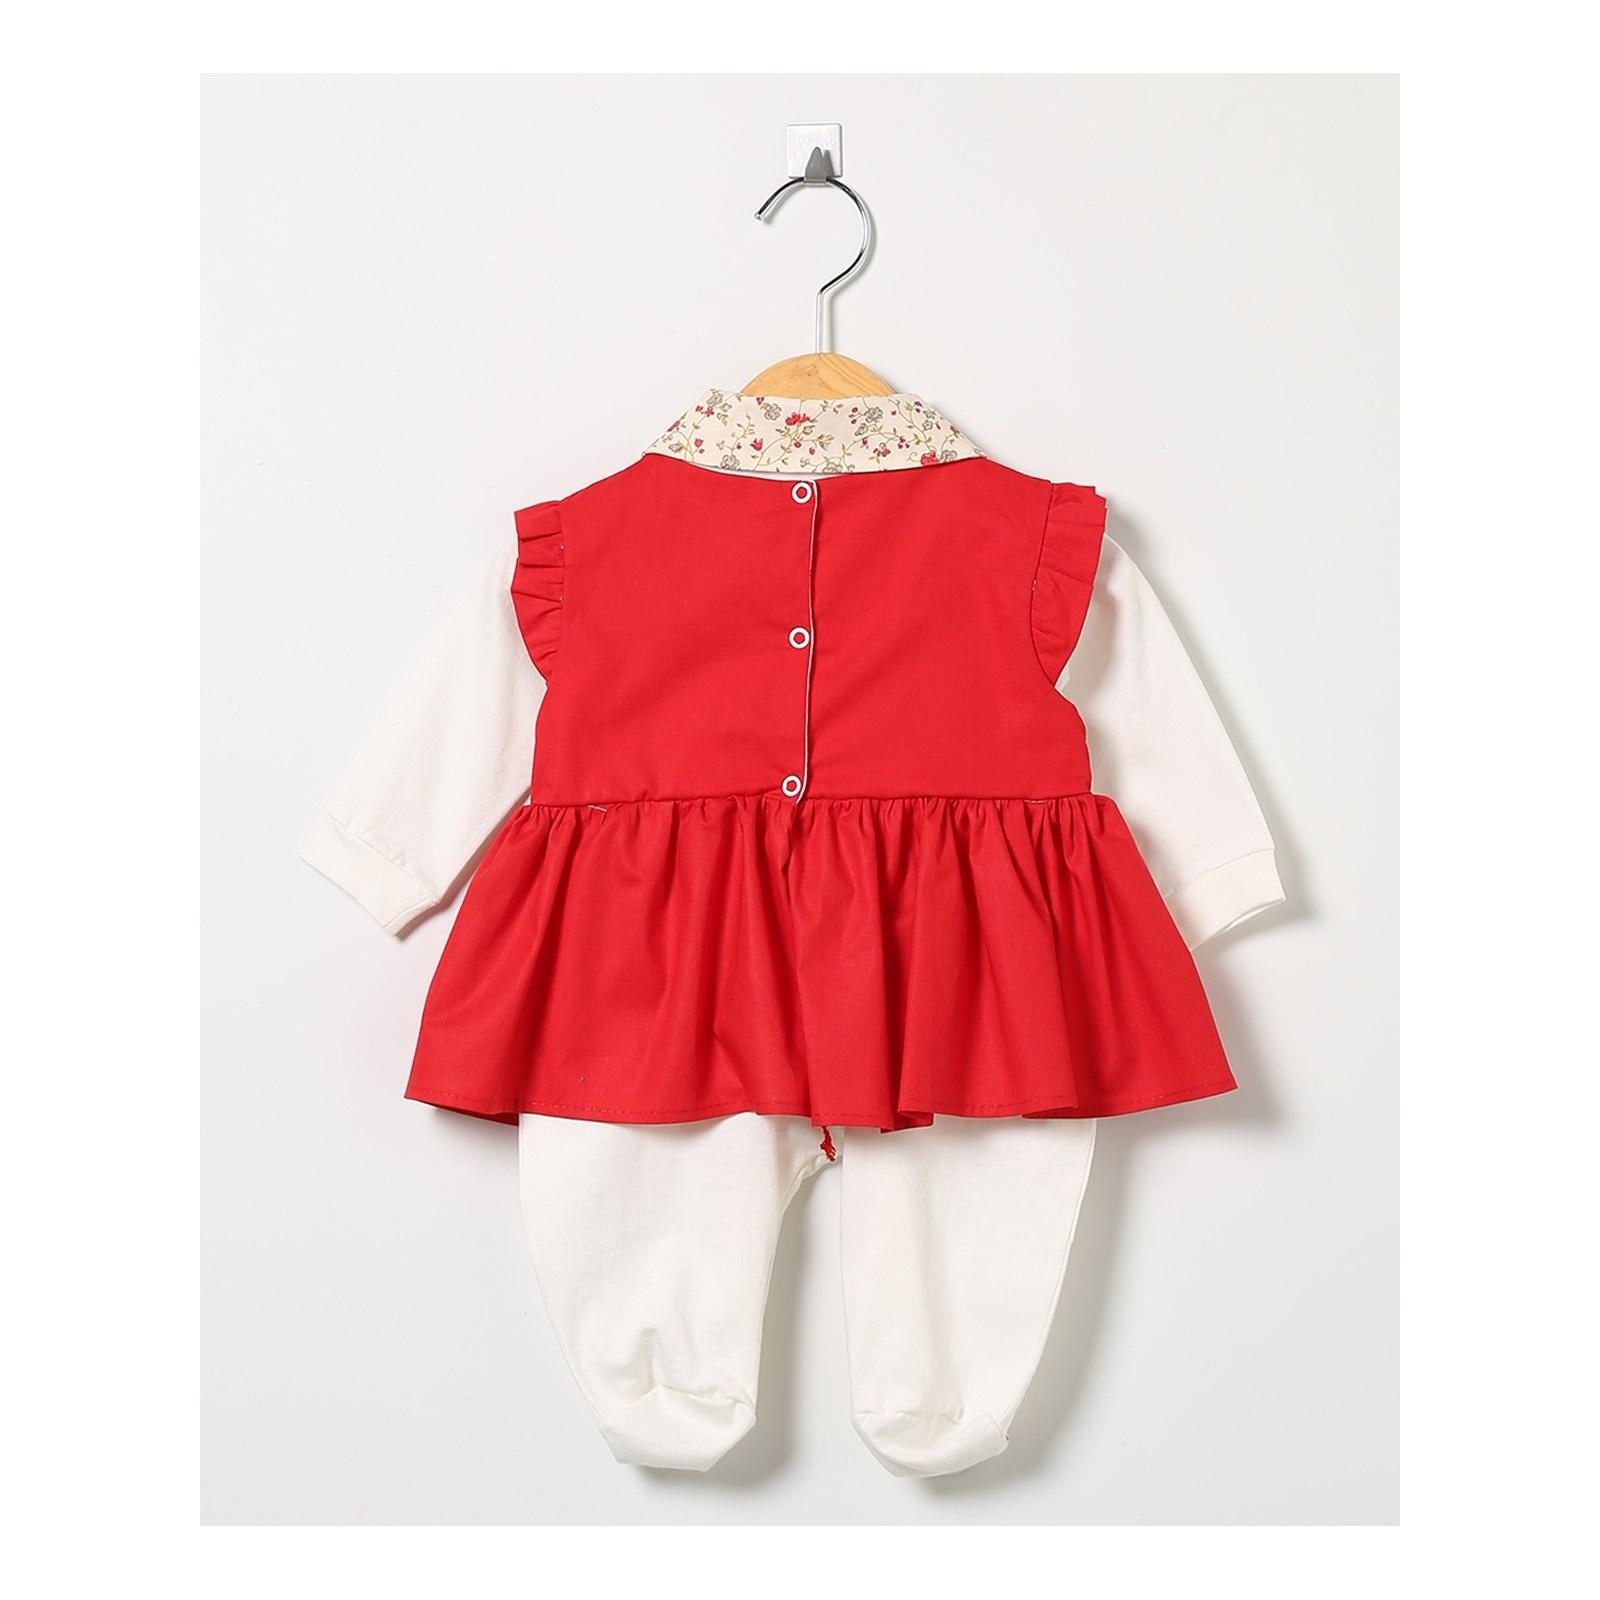 Kit Saída Maternidade Vermelha Princesa 4 Peças 6b181ba4ce6